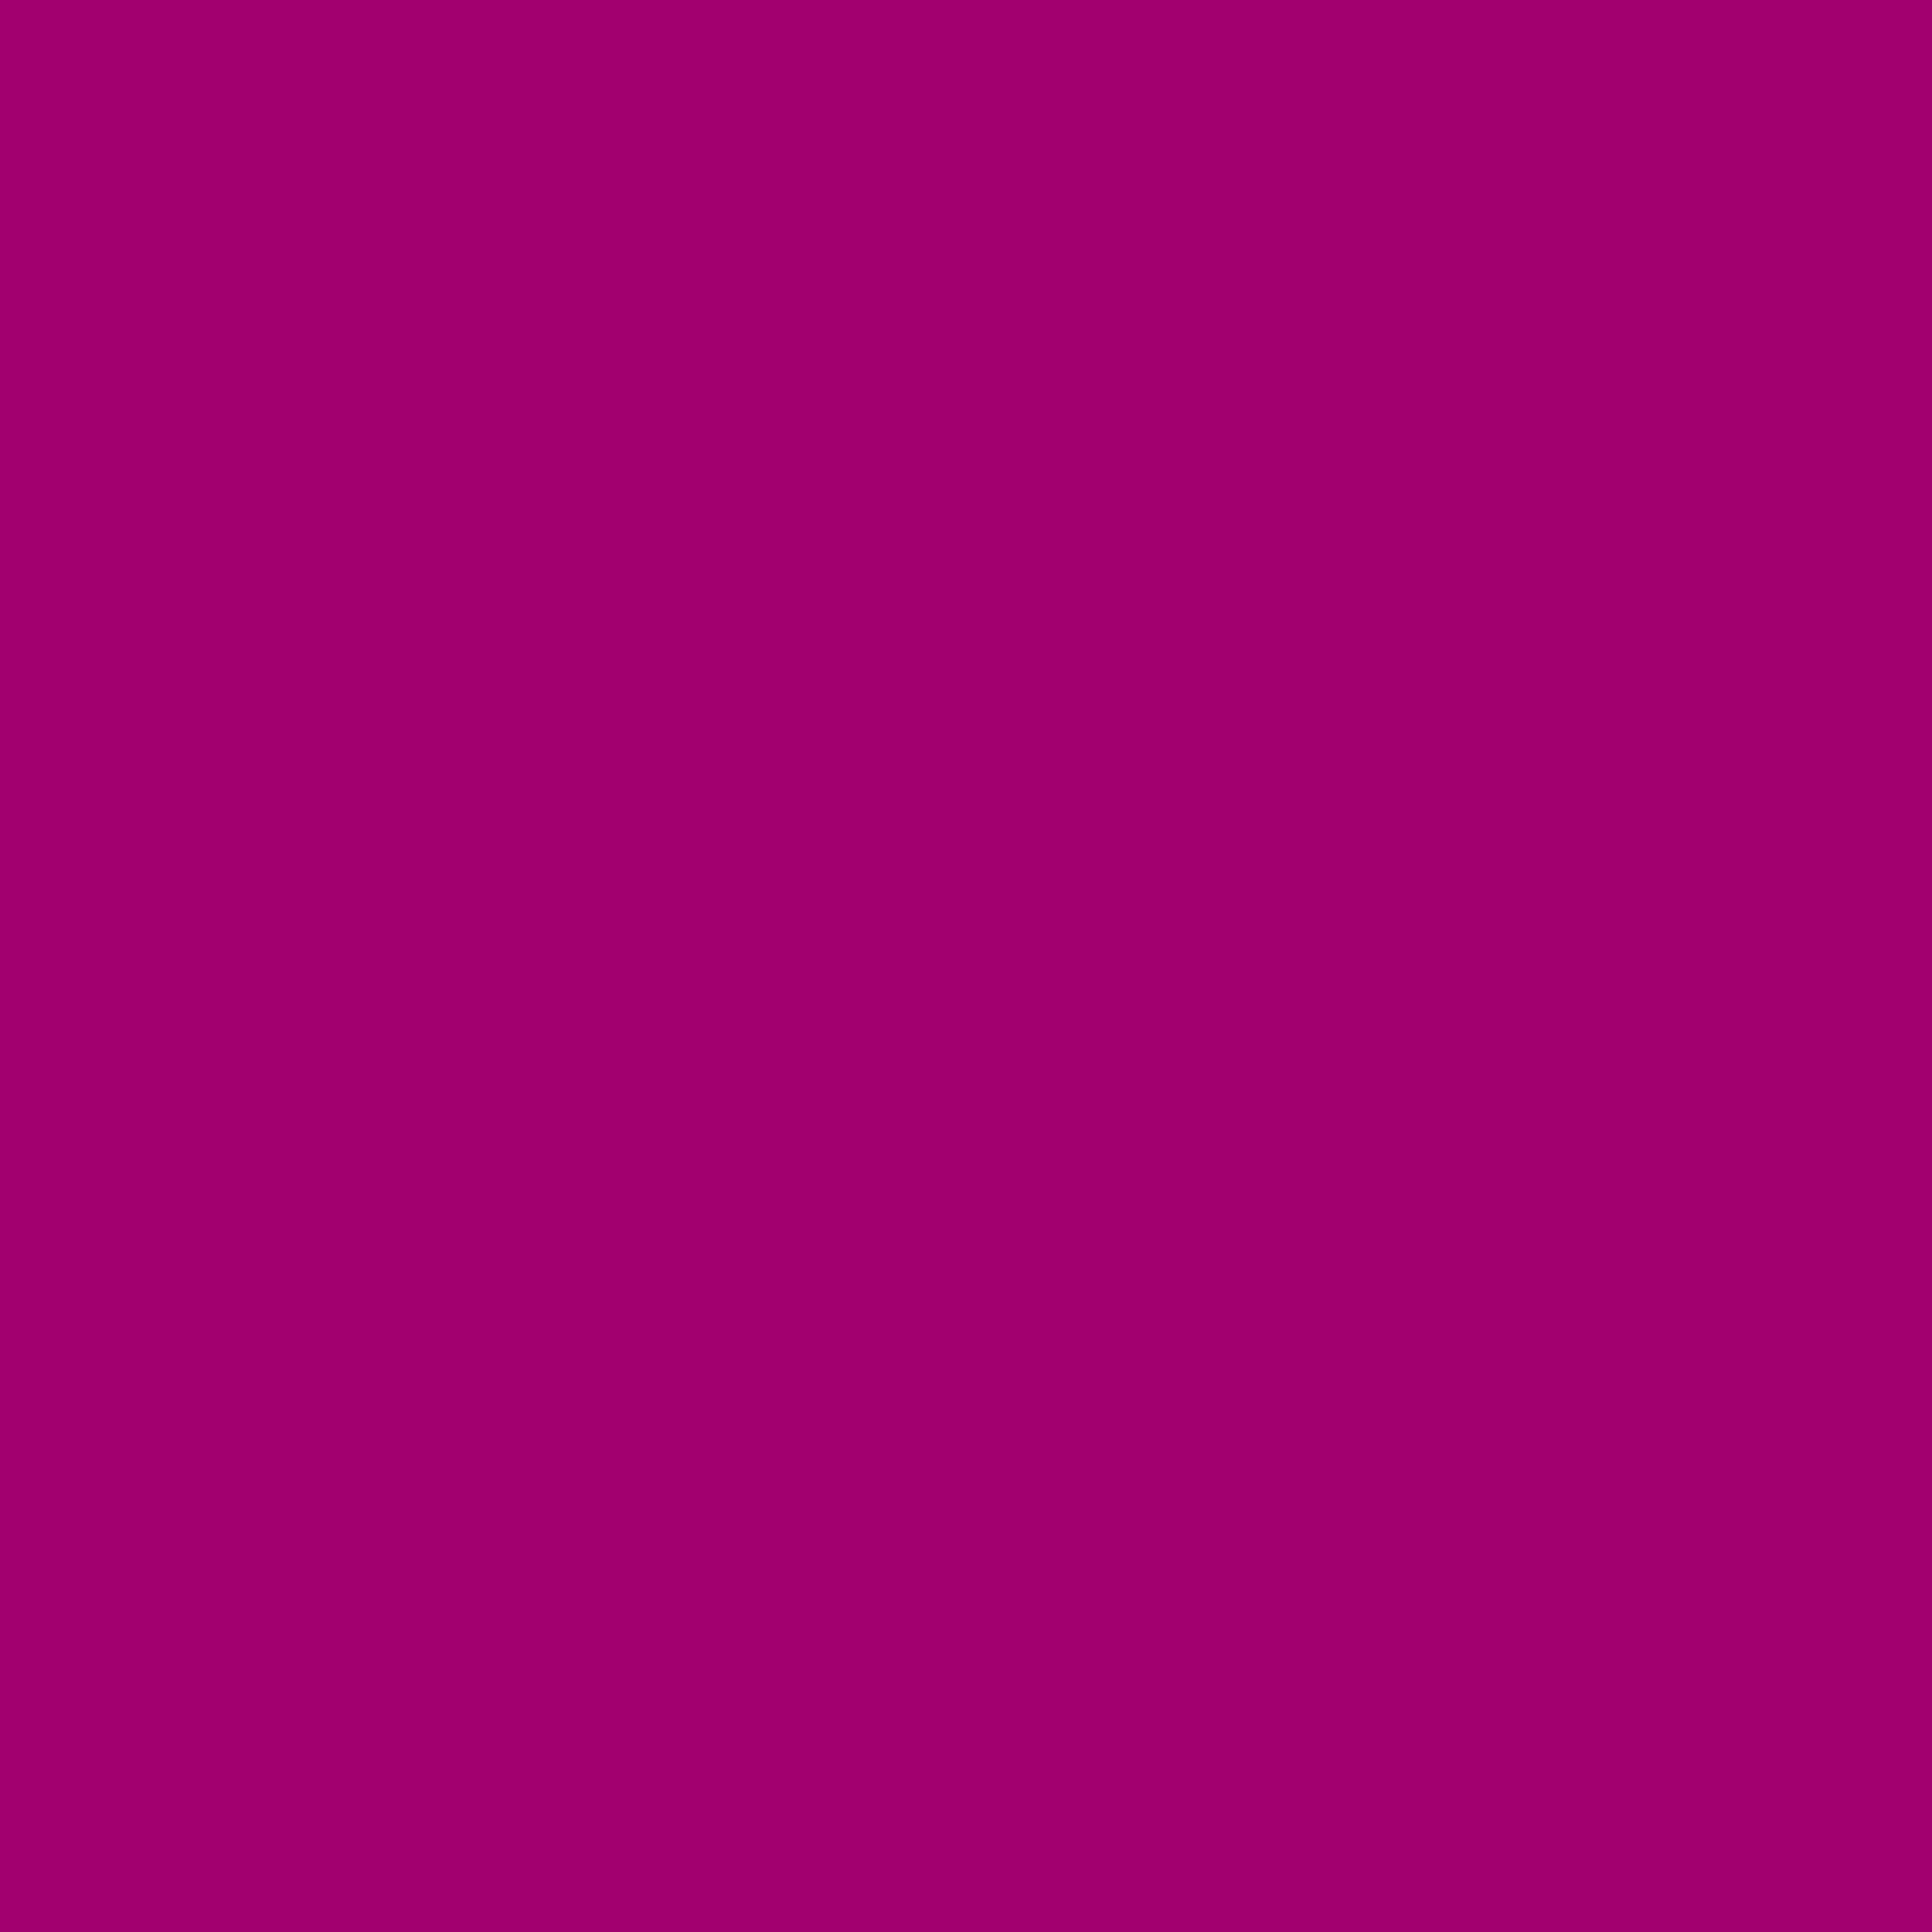 2048x2048 Flirt Solid Color Background